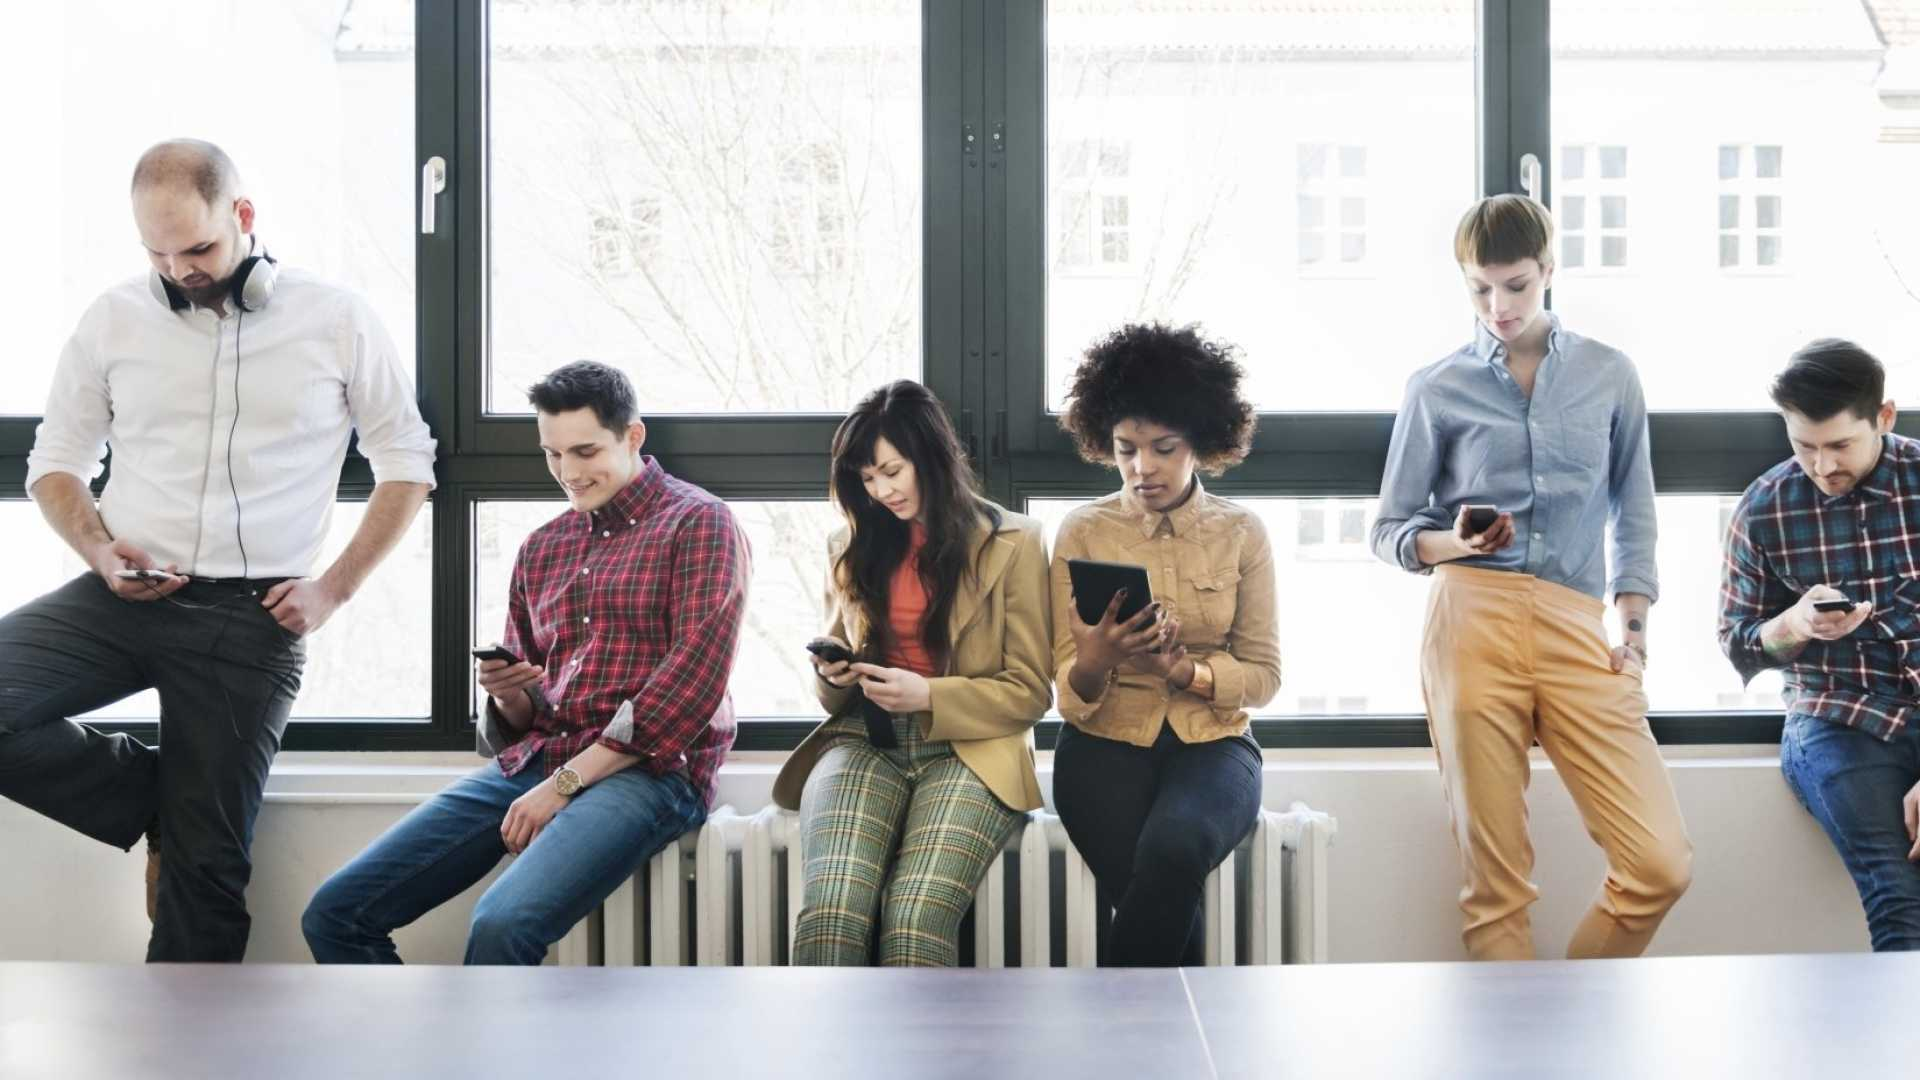 5 Habits That Make Millennials Look Really Unprofessional